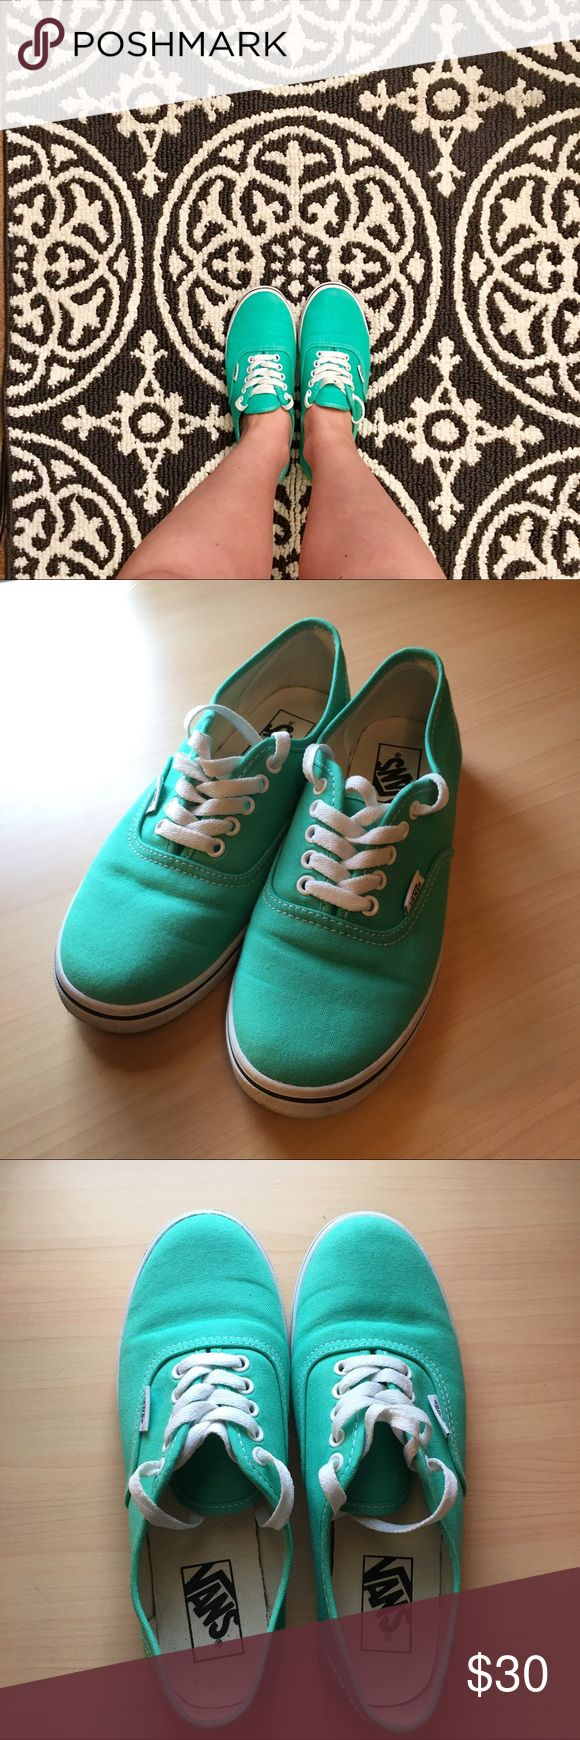 Teal Vans Teal Authentic Lo Pro Vans Sneakers. Women's US 7. Like new. Worn maybe twice. No stains. Vans Shoes Sneakers